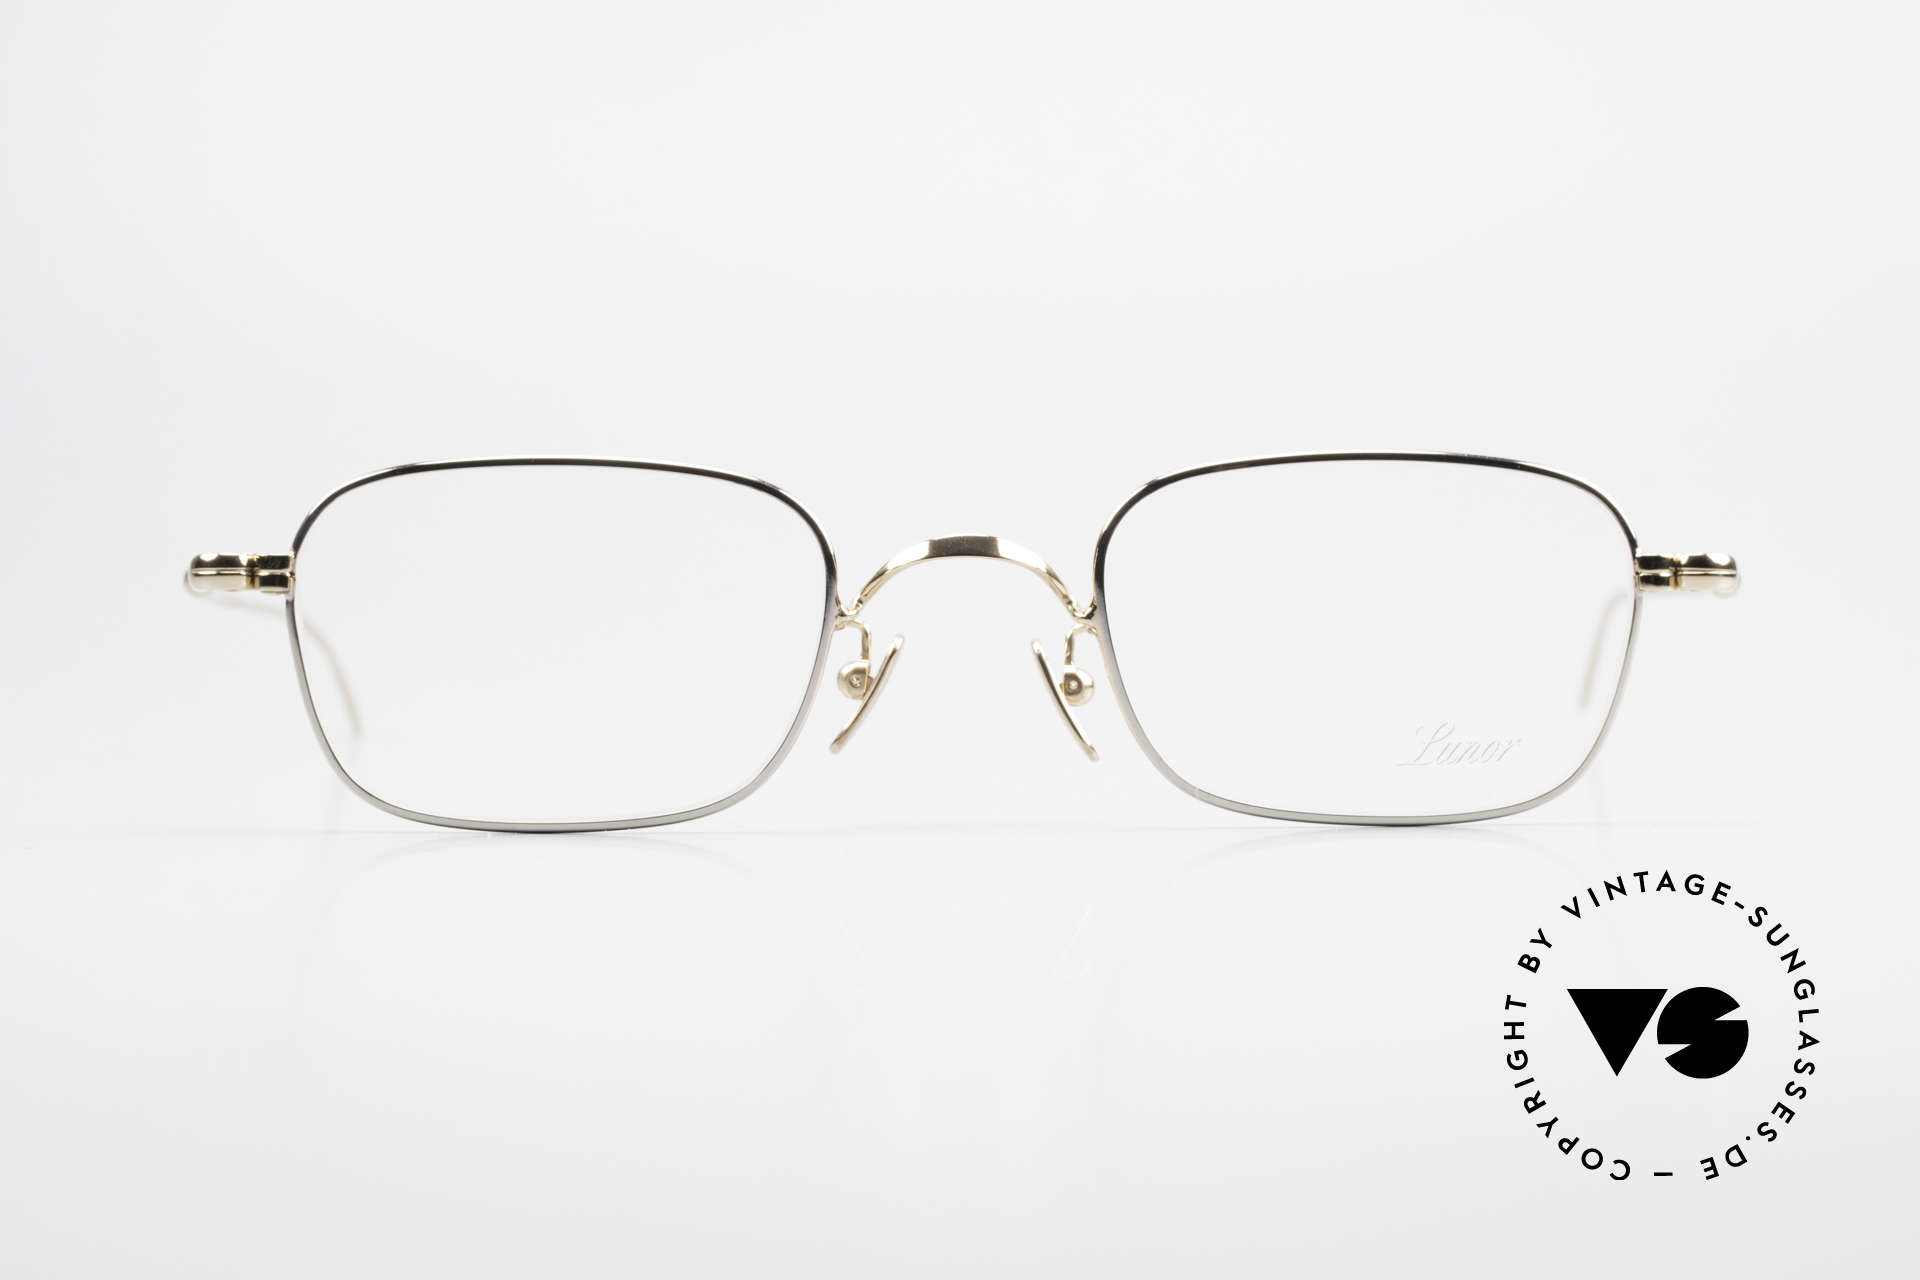 Lunor V 109 Old Lunor Men's Frame Metal, LUNOR: honest craftsmanship with attention to details, Made for Men